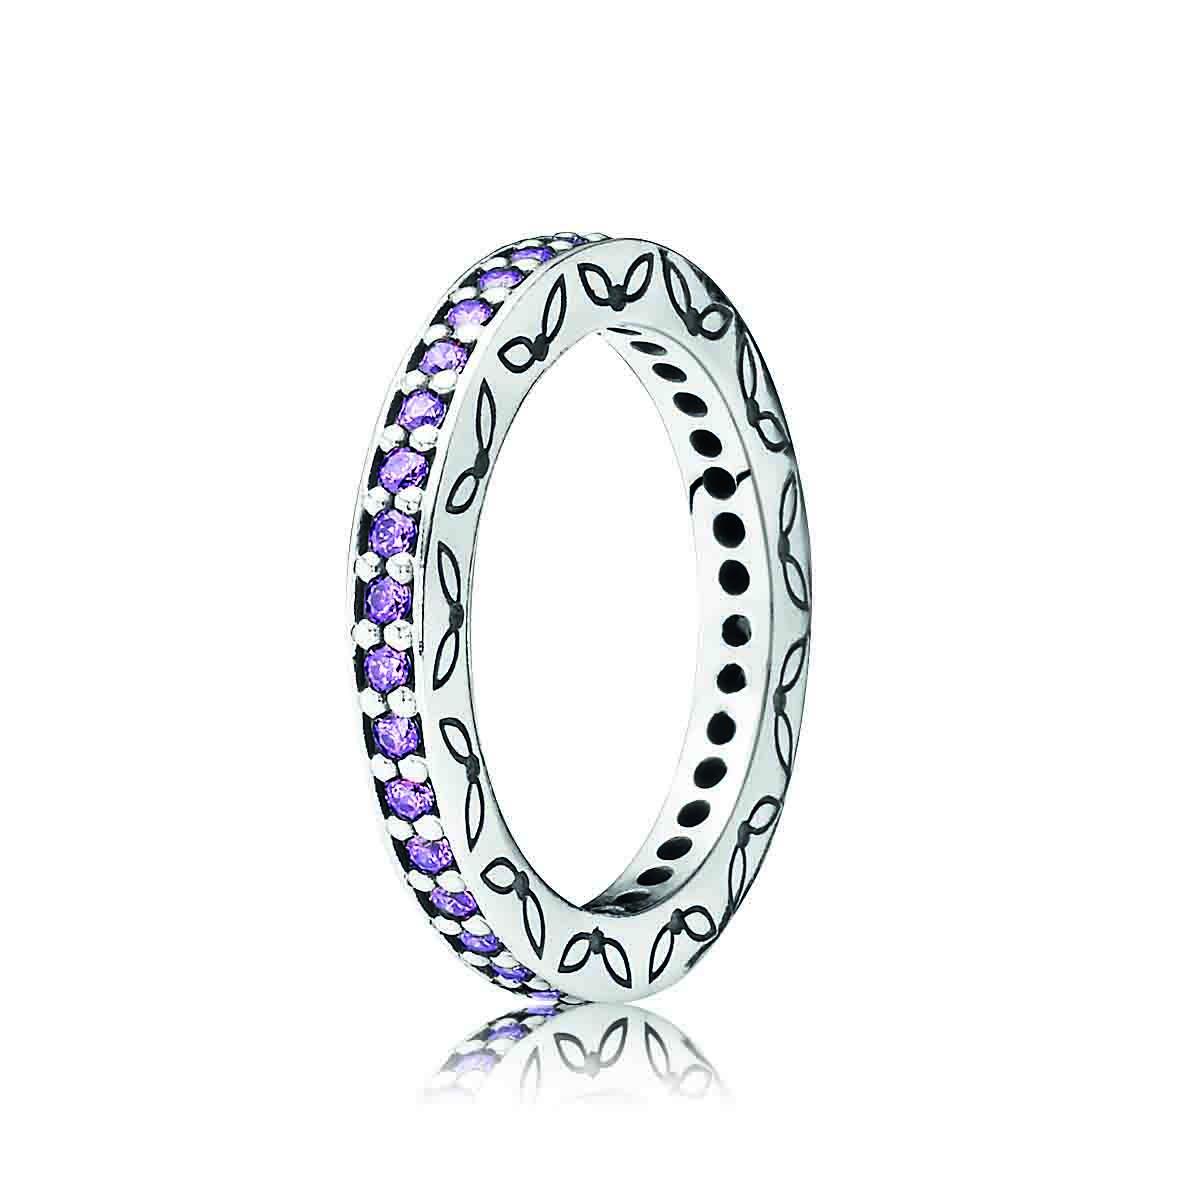 pandora ring in amethyst jewelry